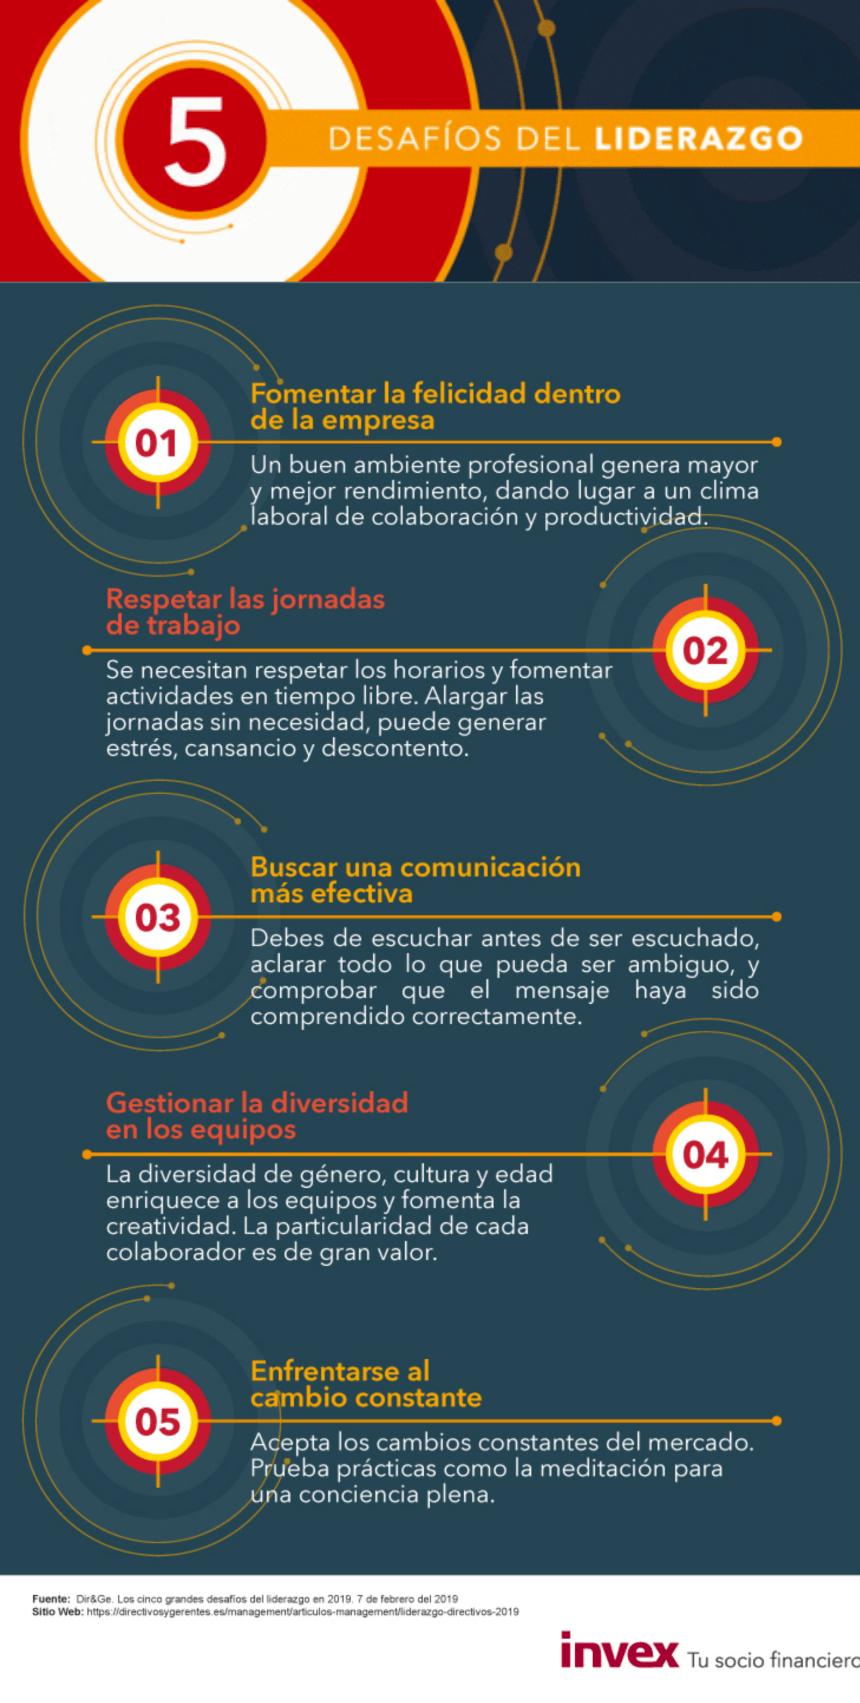 5 desafíos del Liderazgo #infografia #infographic #leadership